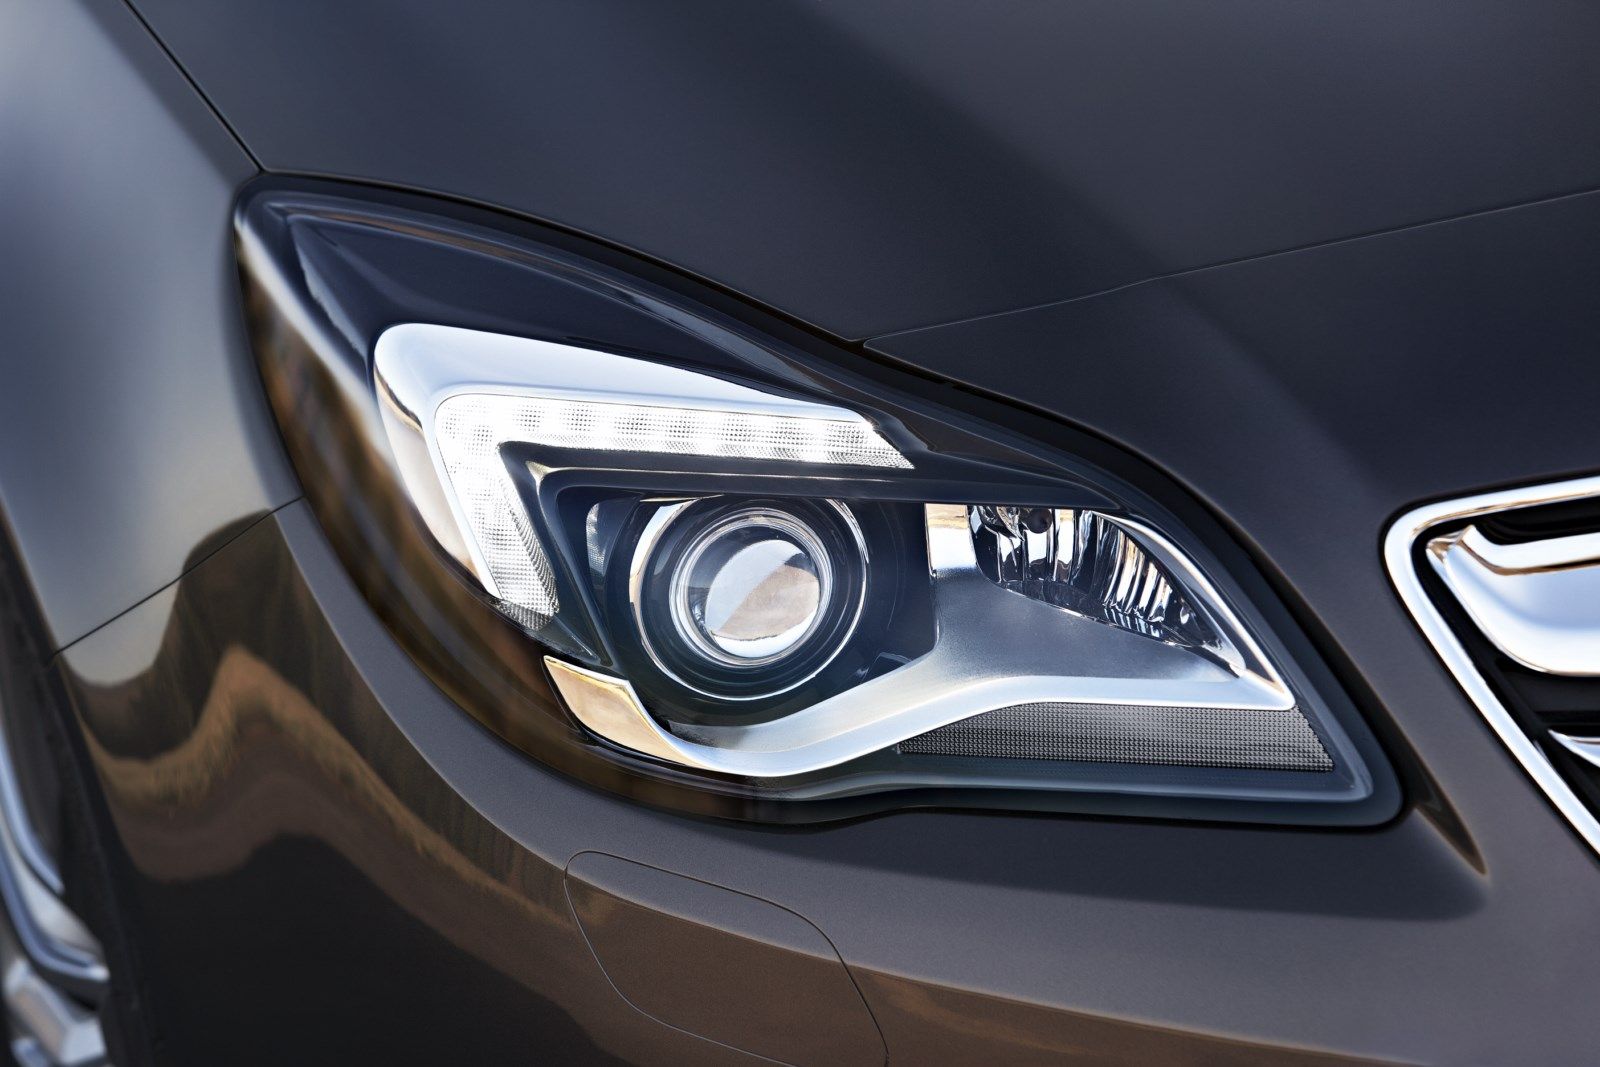 Prueba opel insignia 2 0 cdti 140 cv 5 puertas revista for K and w motors